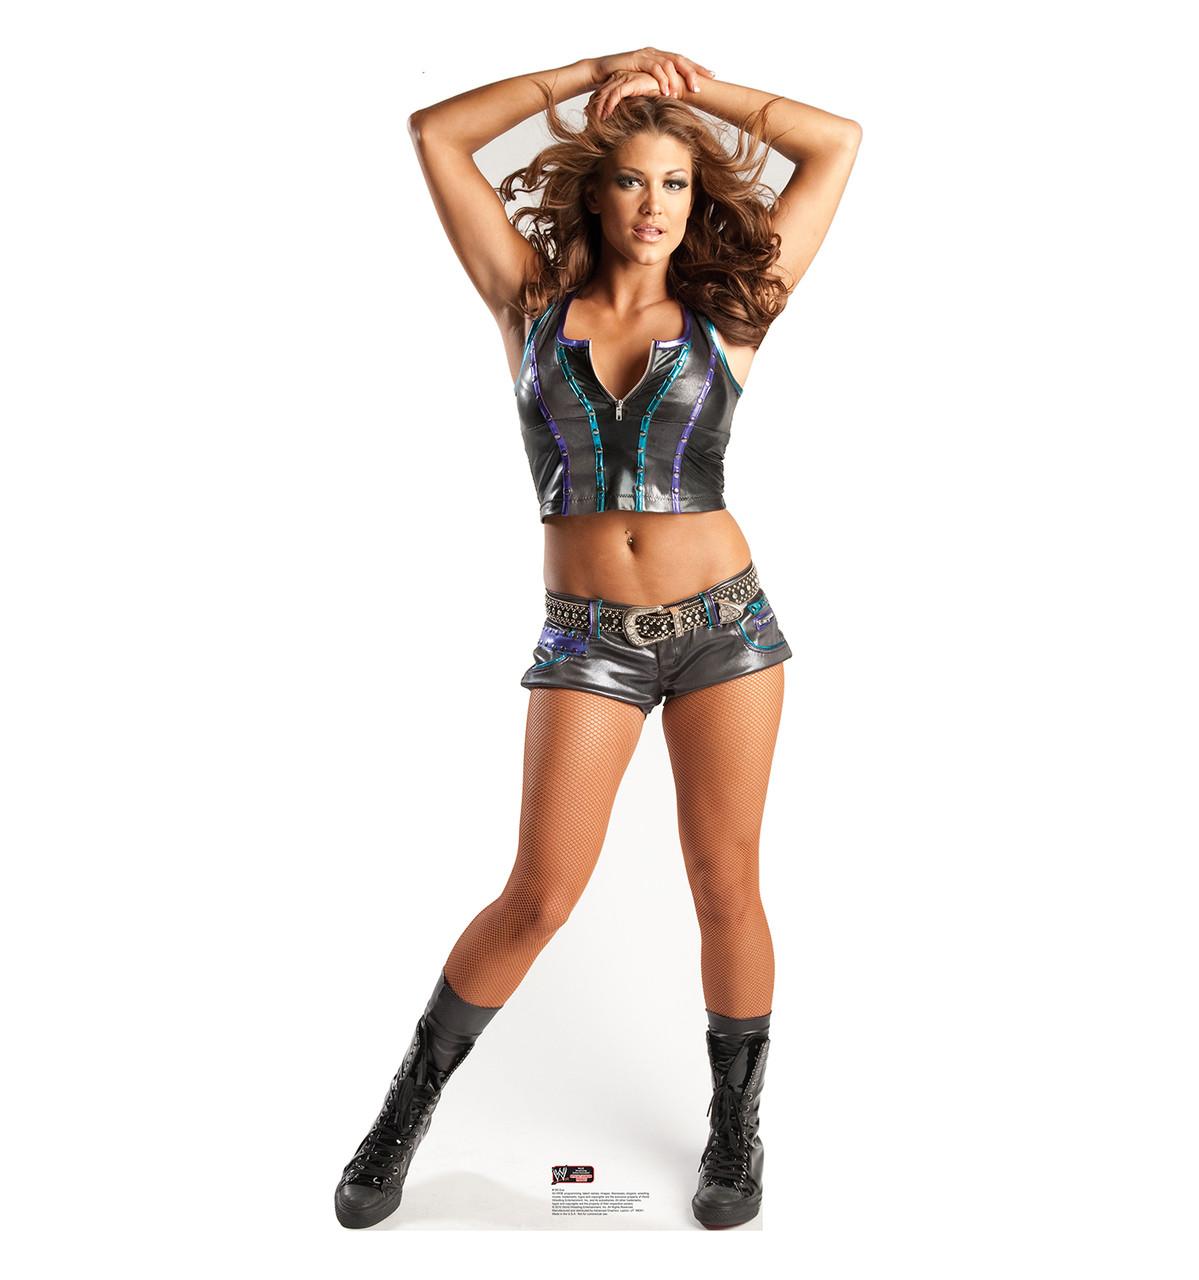 Eve Torres - WWE - Cardboard Cutout